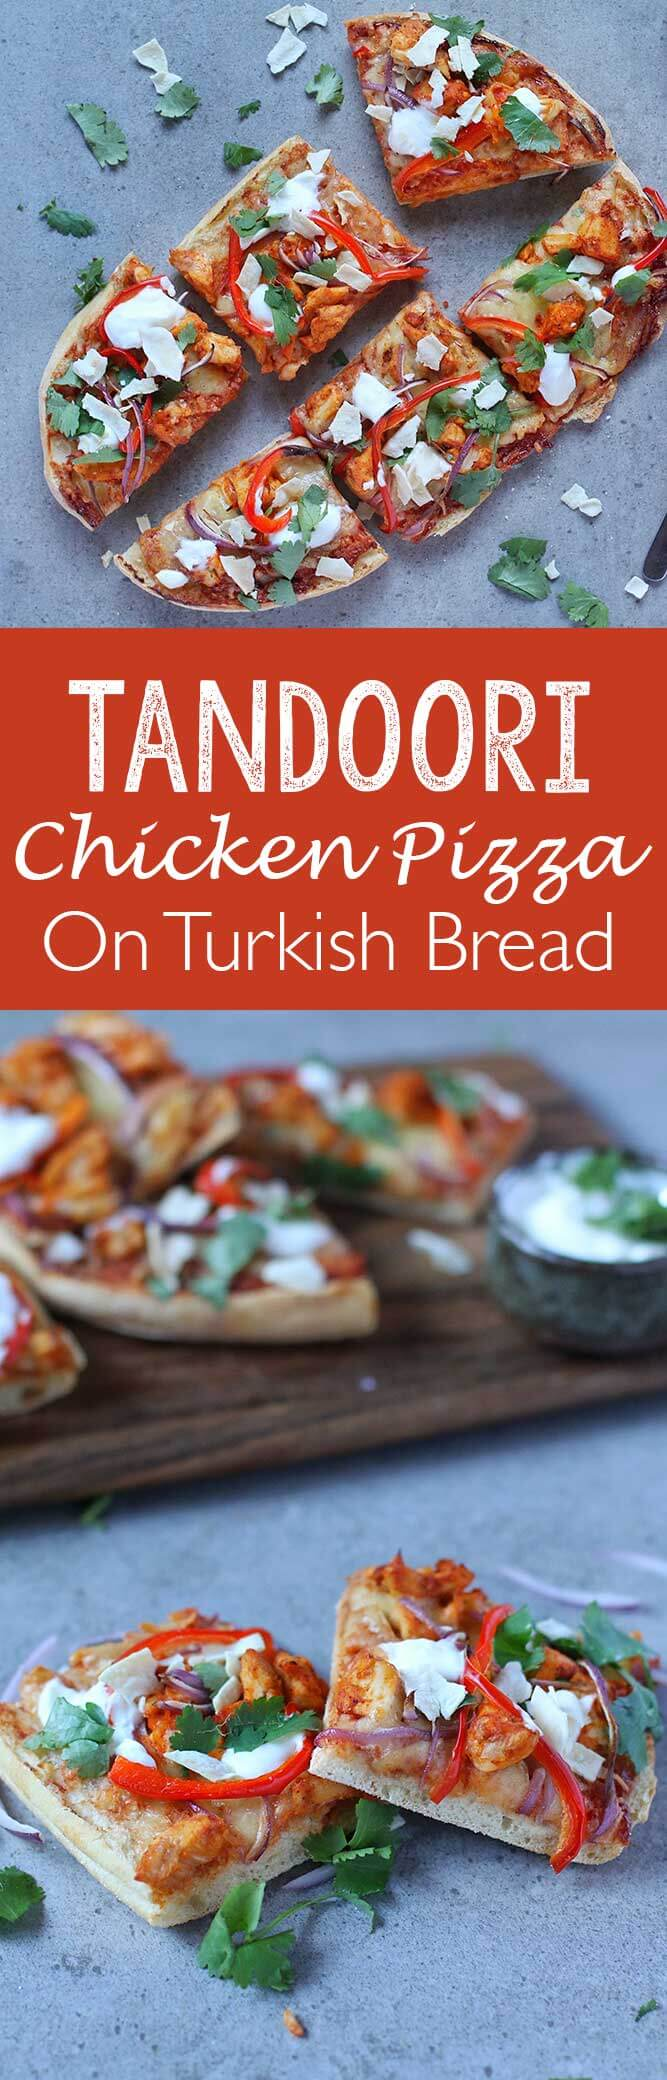 Tandoori Chicken Pizza on Turkish Bread, a flavorful, tasty, delicious pizza!